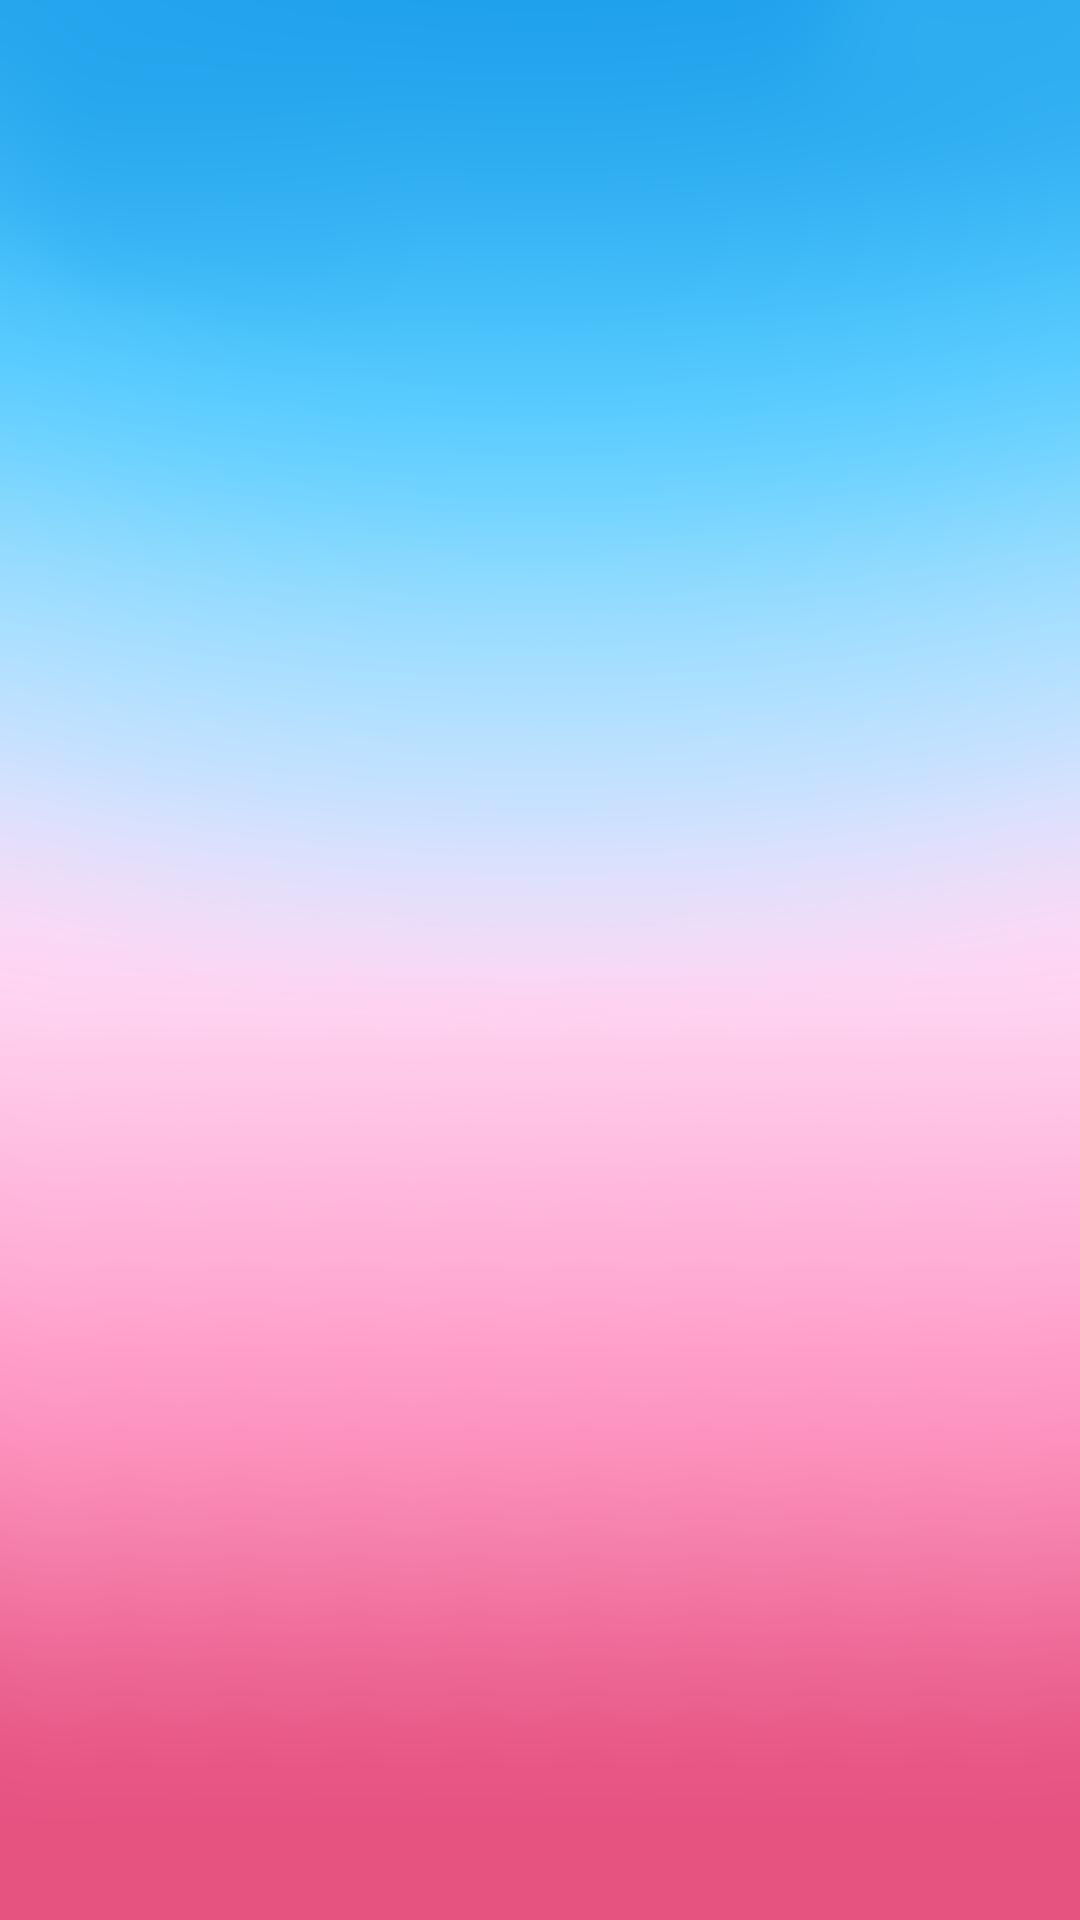 miui_9_wall_techfoogle_06